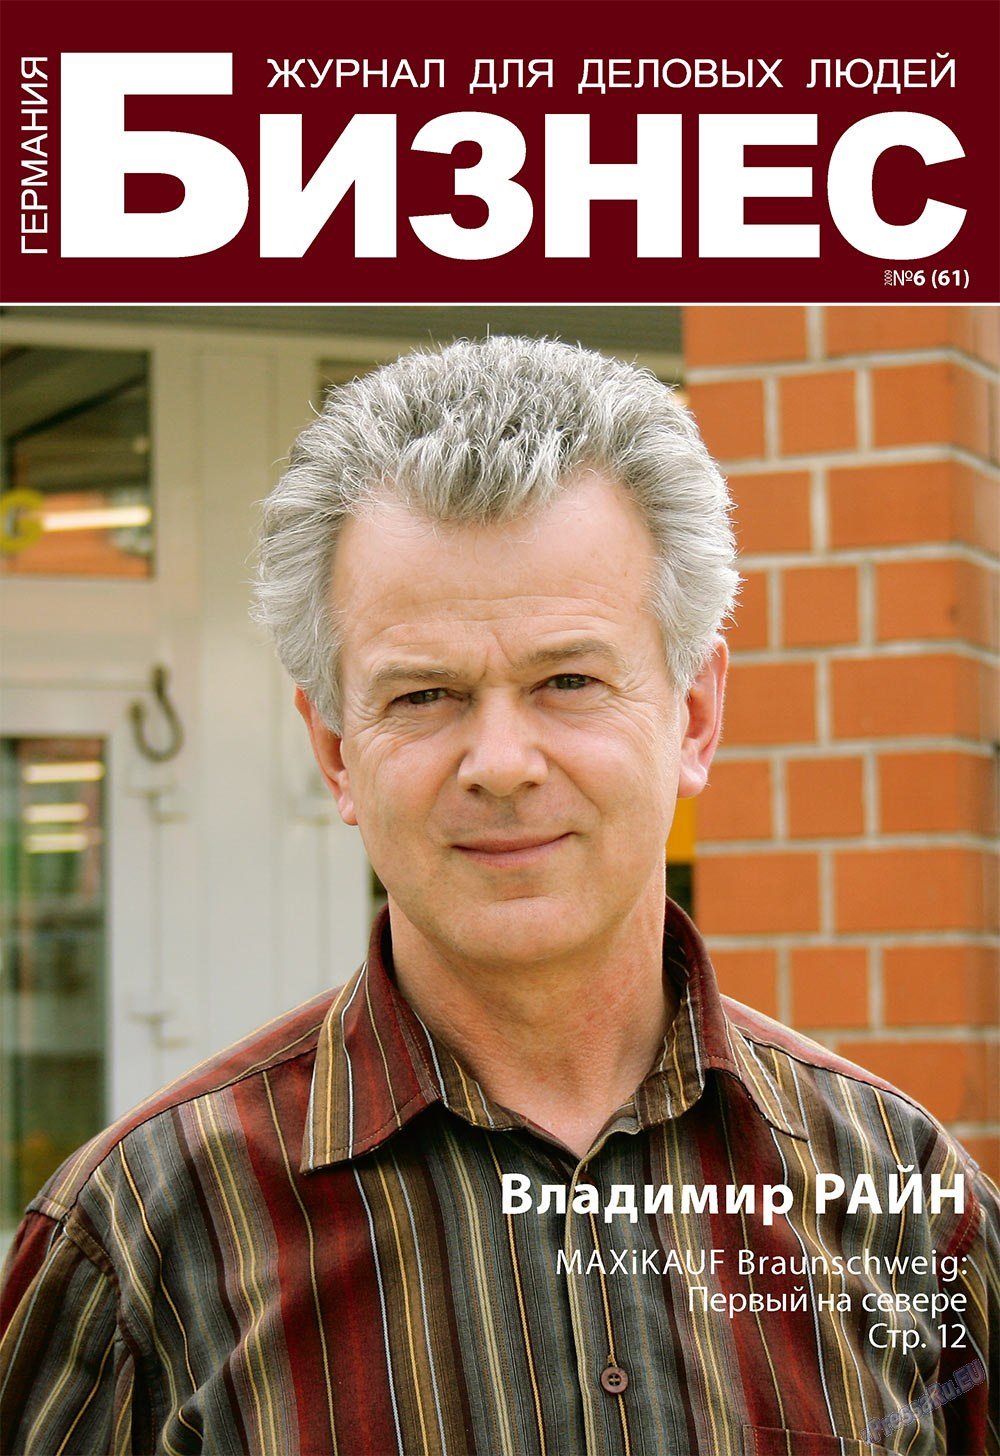 Бизнес (журнал). 2009 год, номер 6, стр. 1